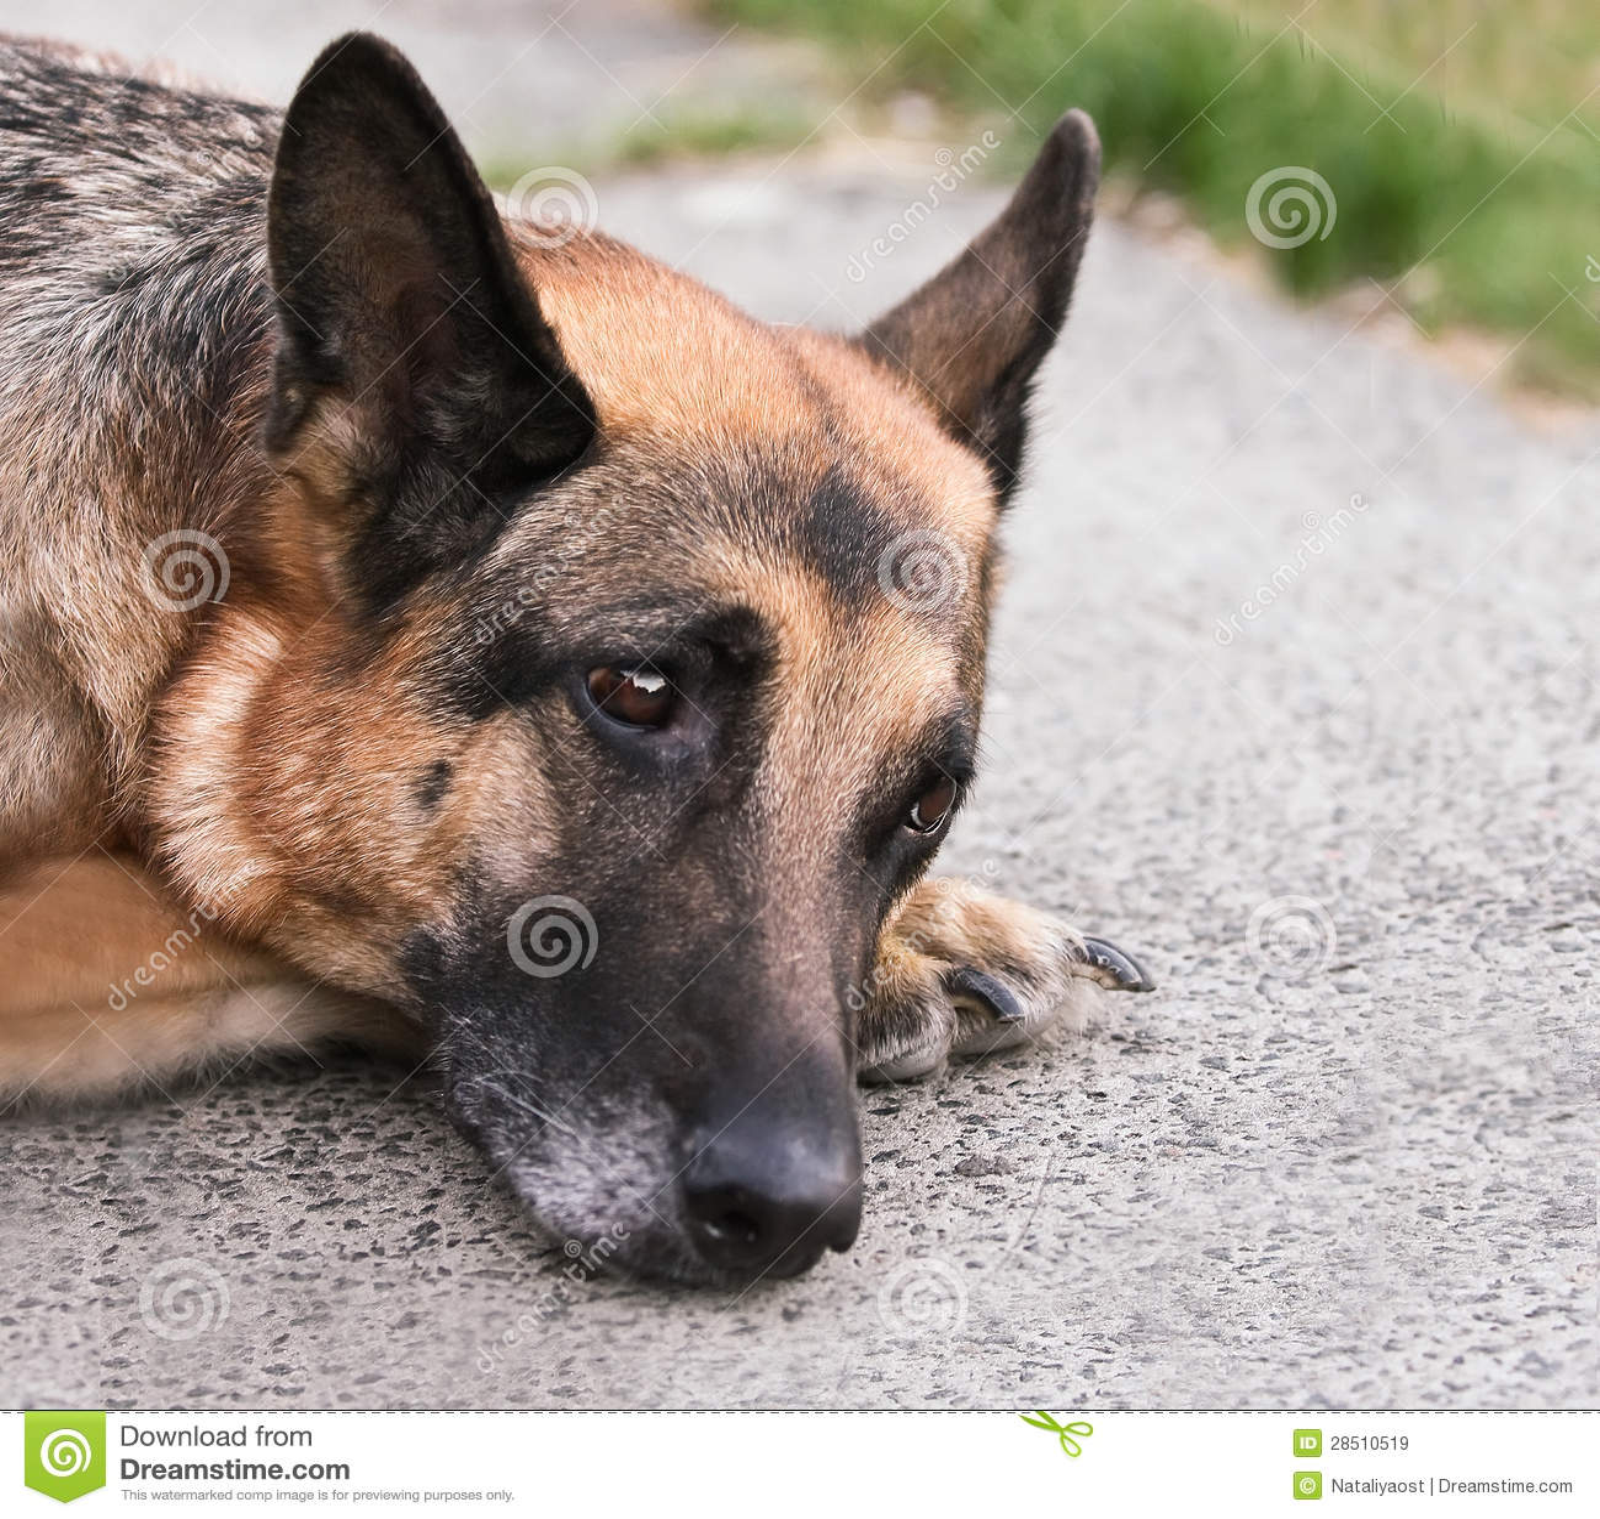 Sad lonely dog on asphalt plates